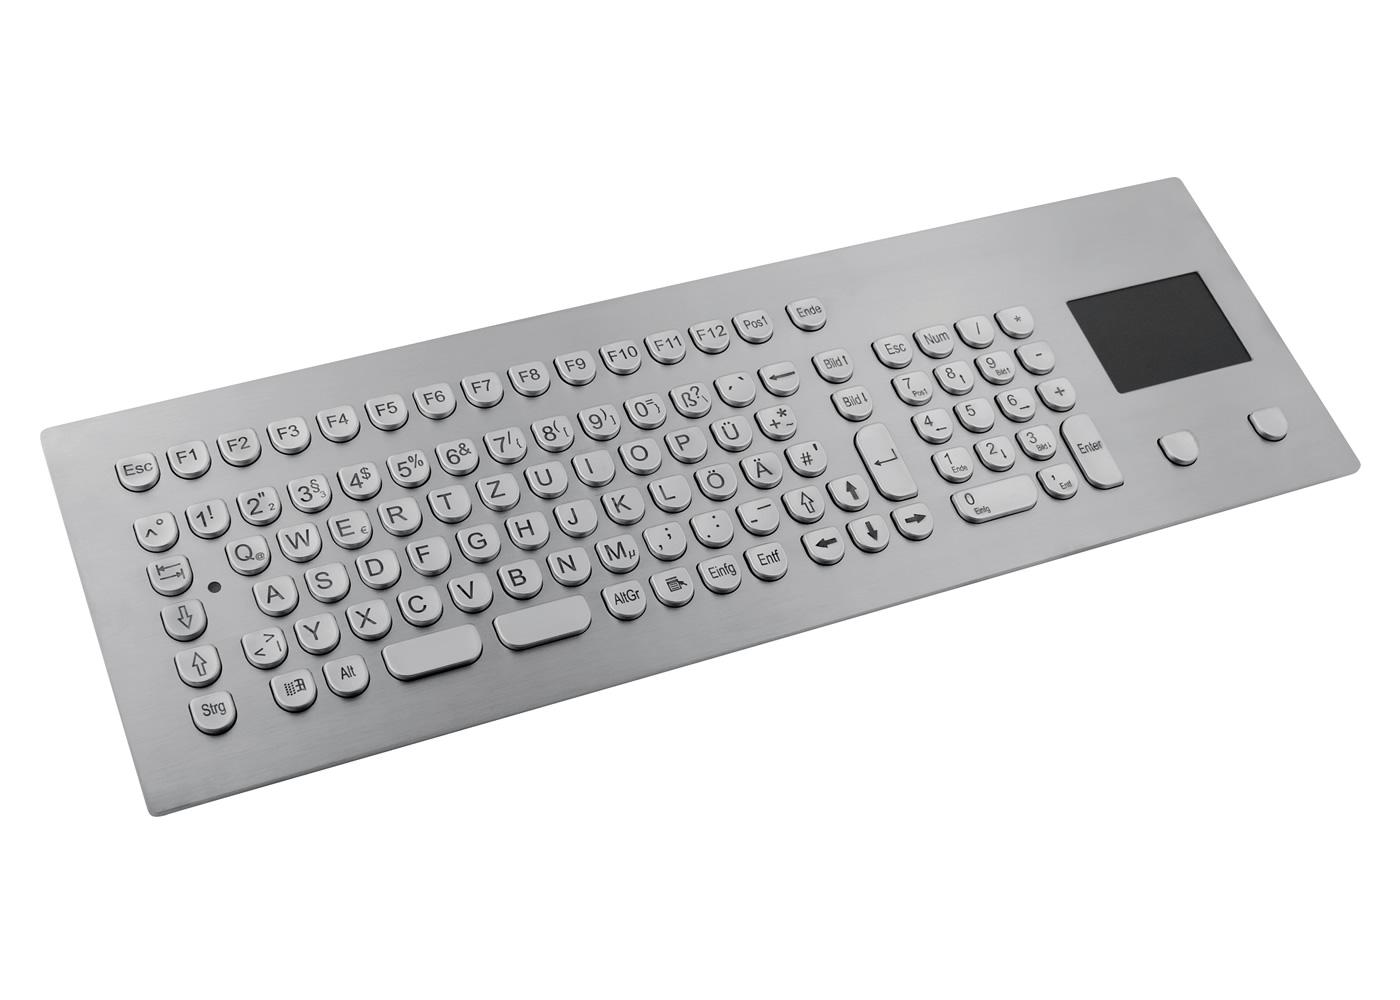 Clavier inox antivandale 105 touches avec touchpad